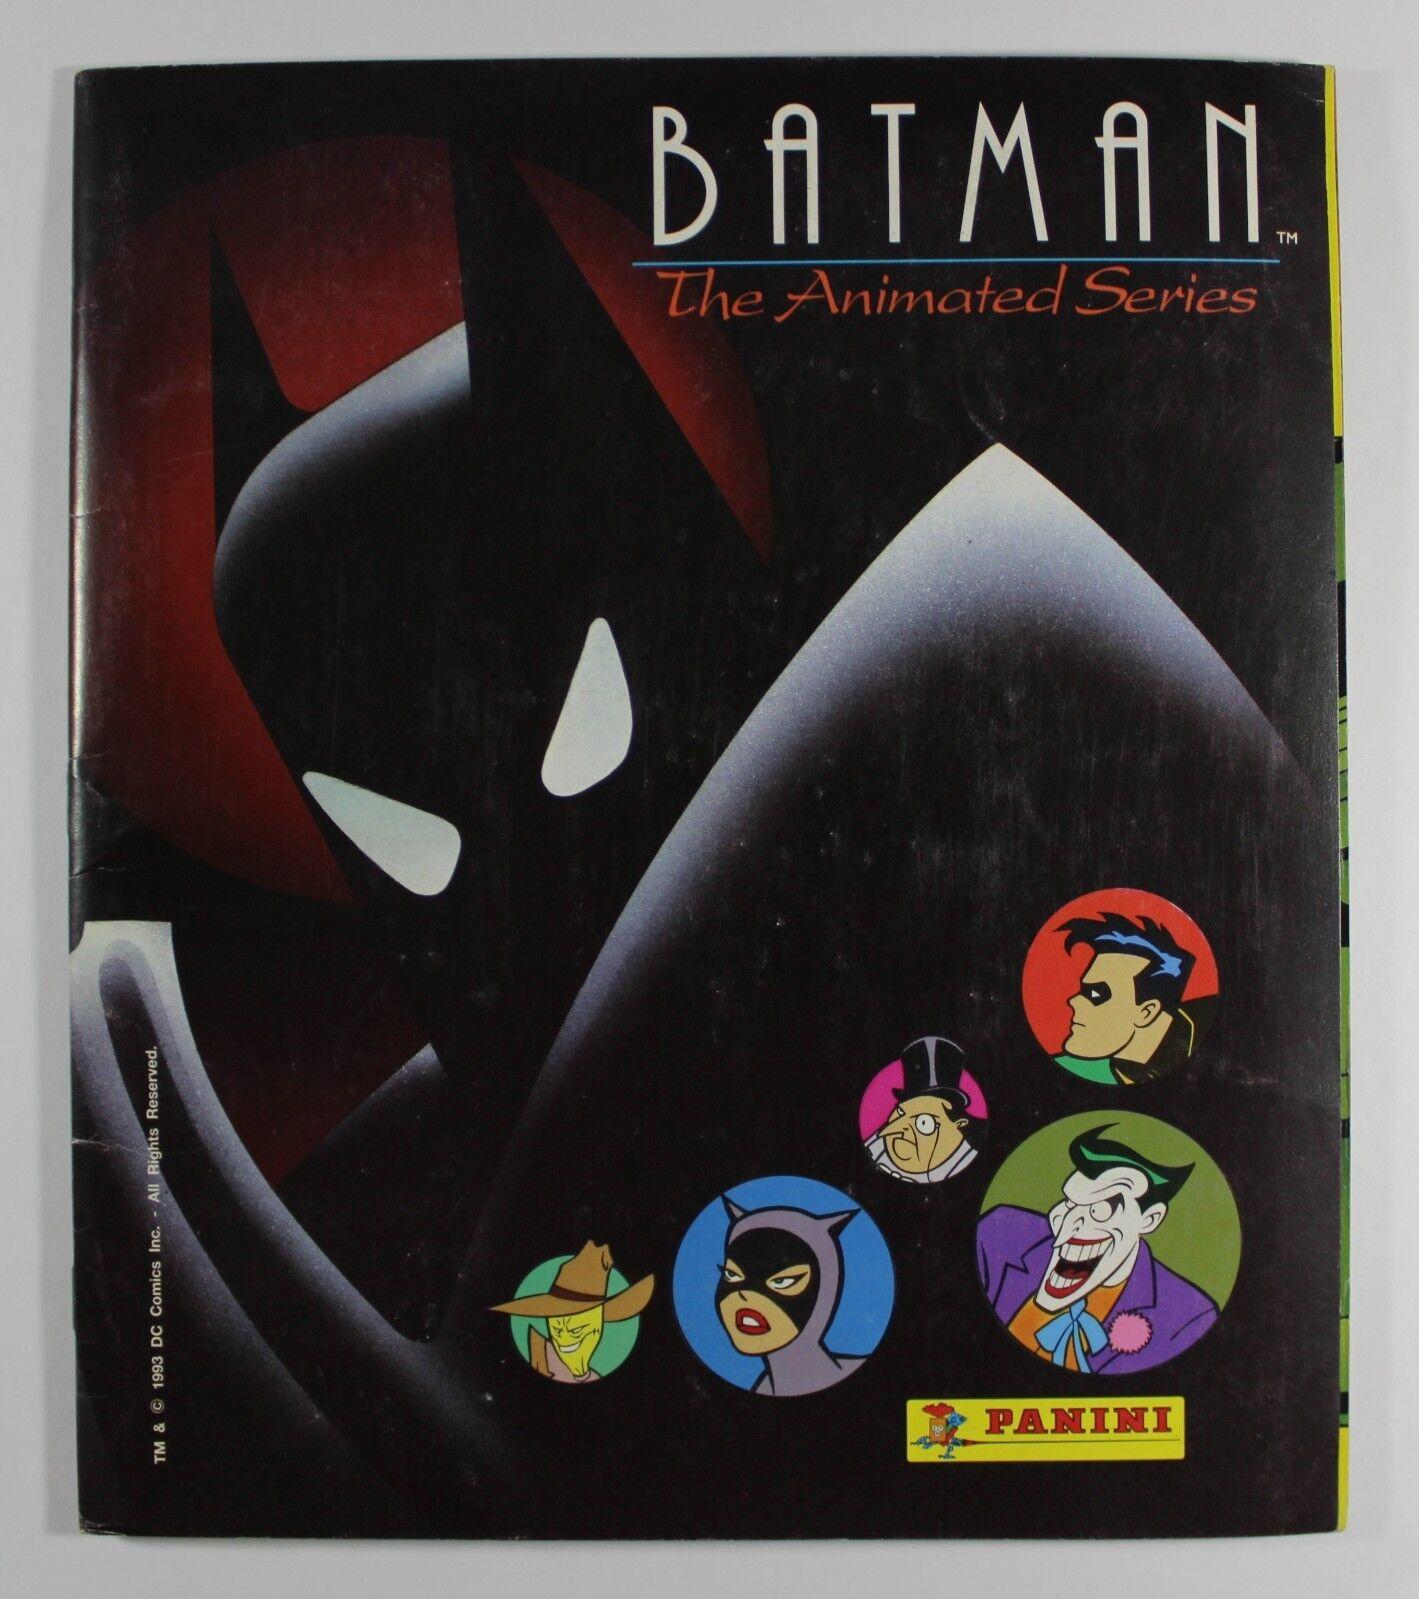 1993 Panini BATMAN ANIMATED SERIES TRADING CARDS ALBUM 100% cmp cmp cmp w ALL holo cards 7e5005